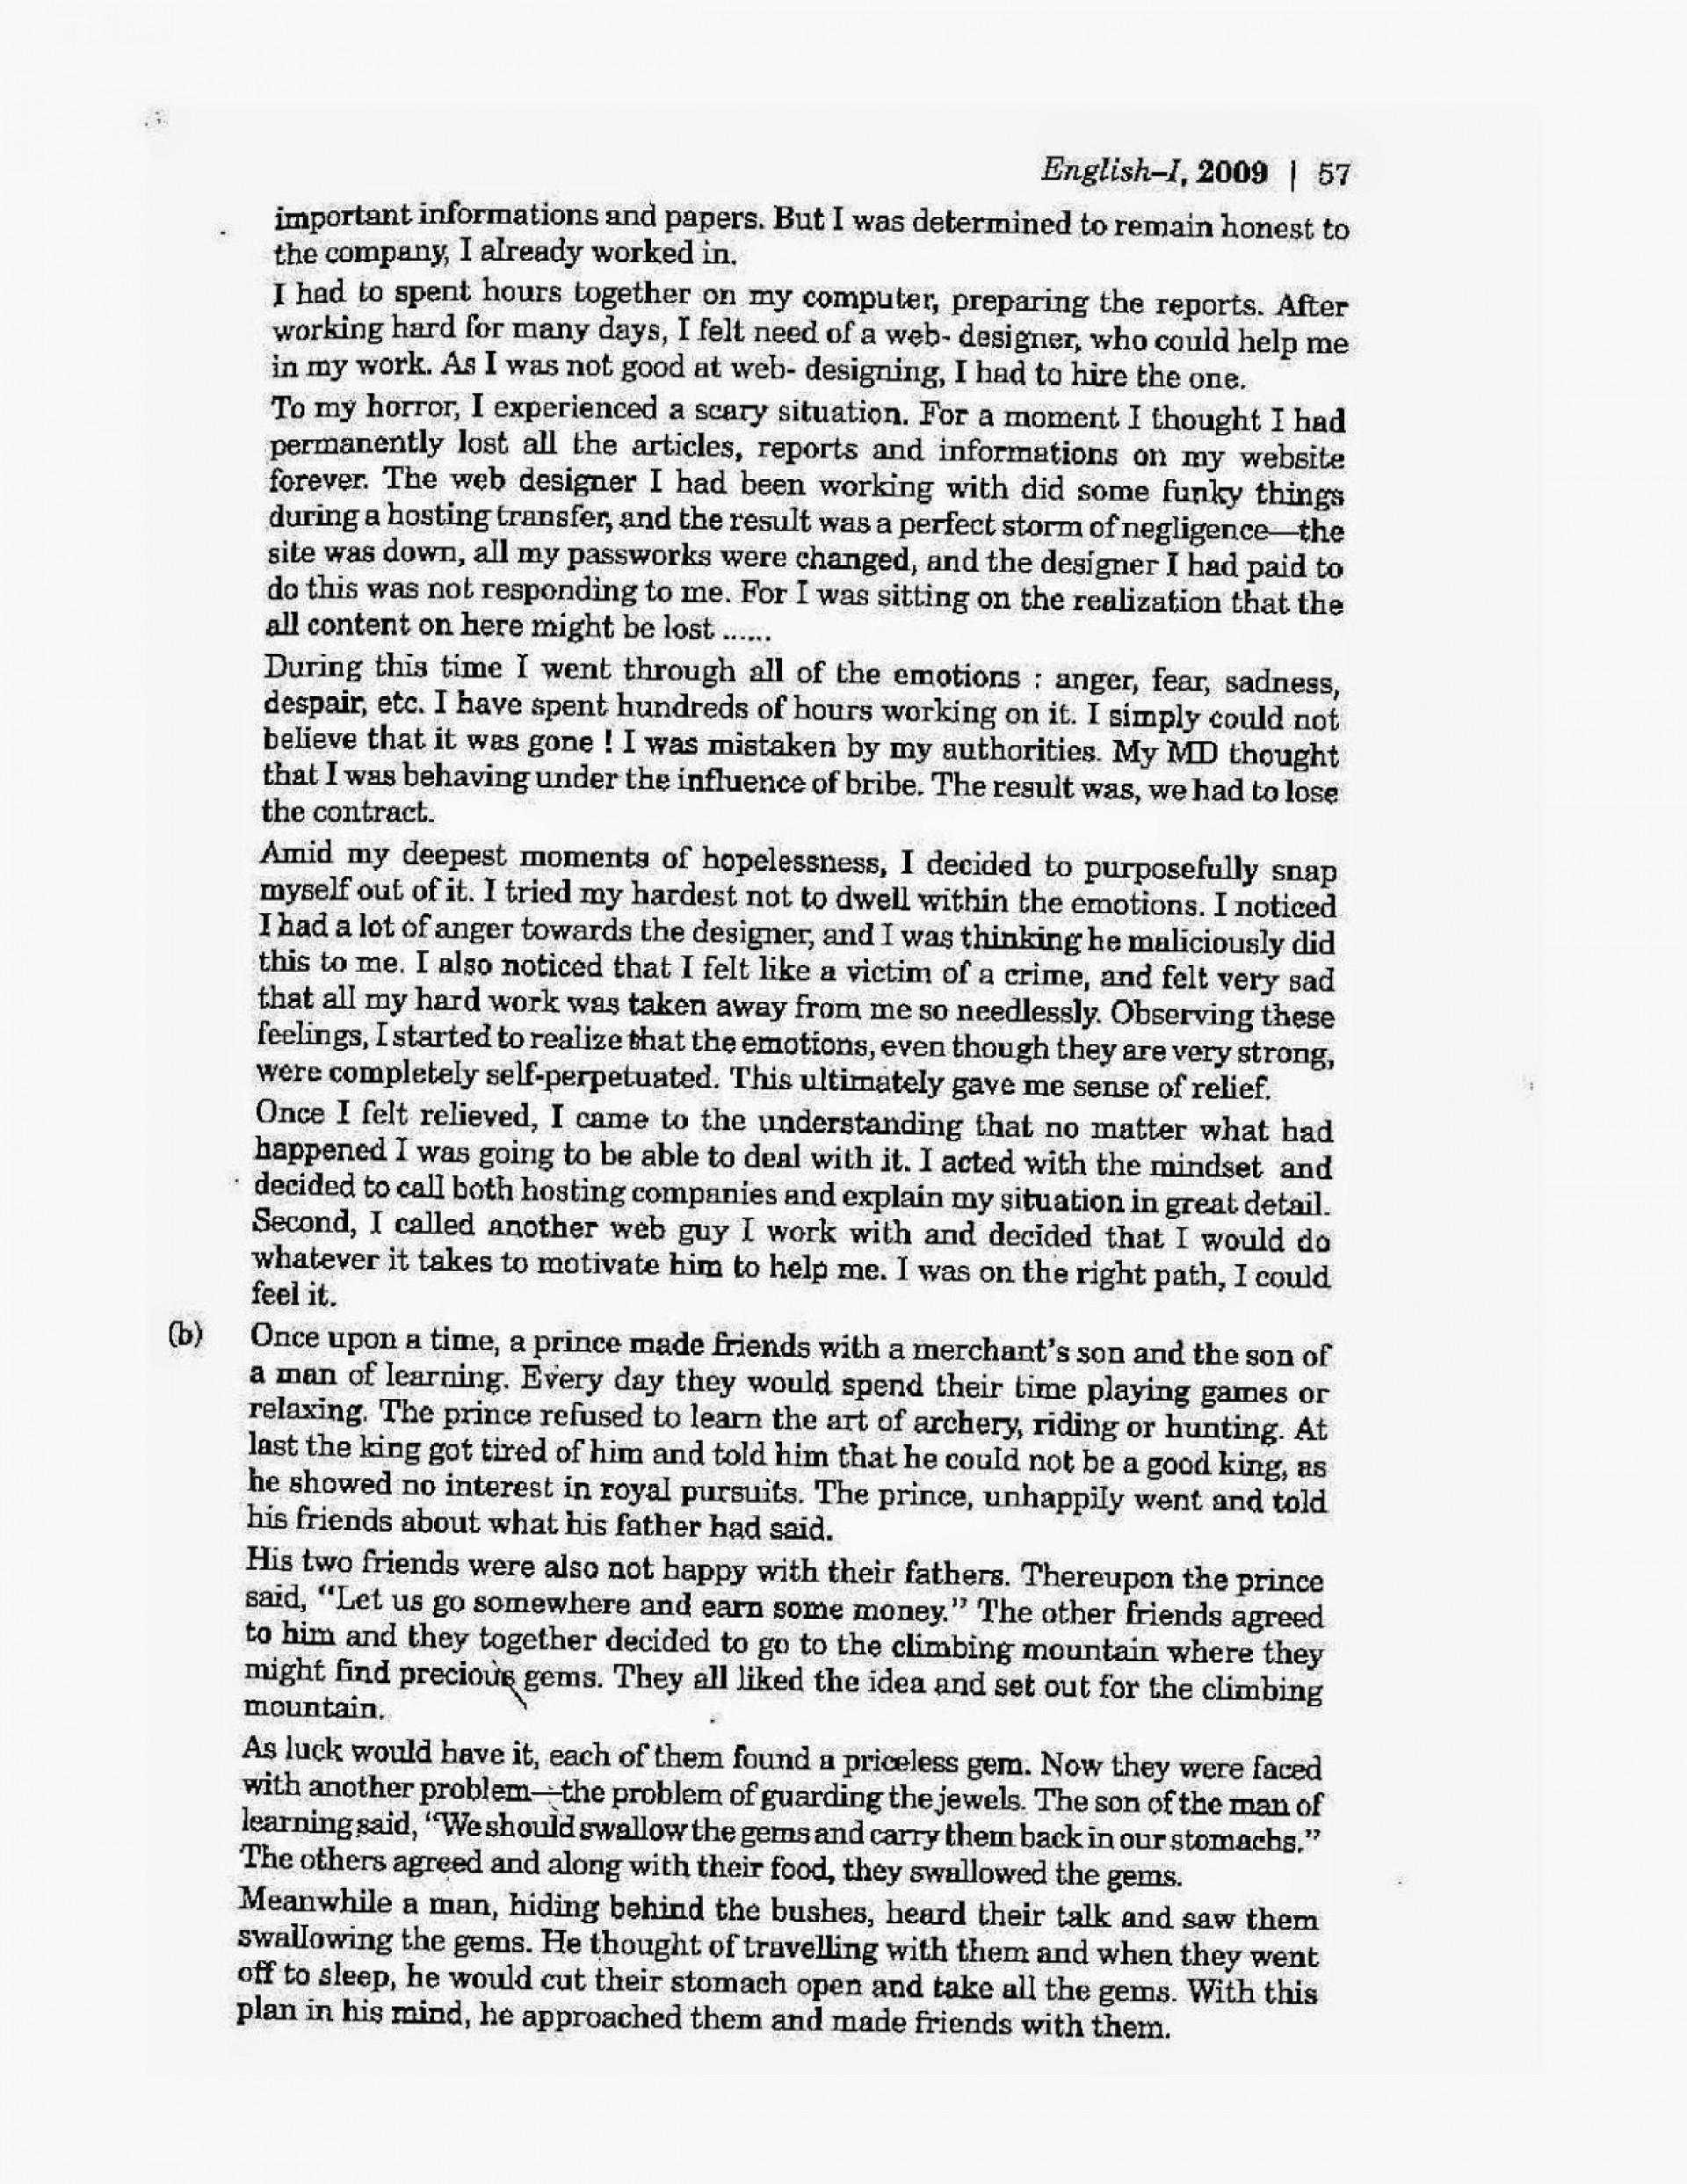 007 Grade English Essays Icse2benglish2bclass2b102b2009 Page Wonderful 12 Essay Examples Narrative Provincial Exam Sample Manitoba 1920